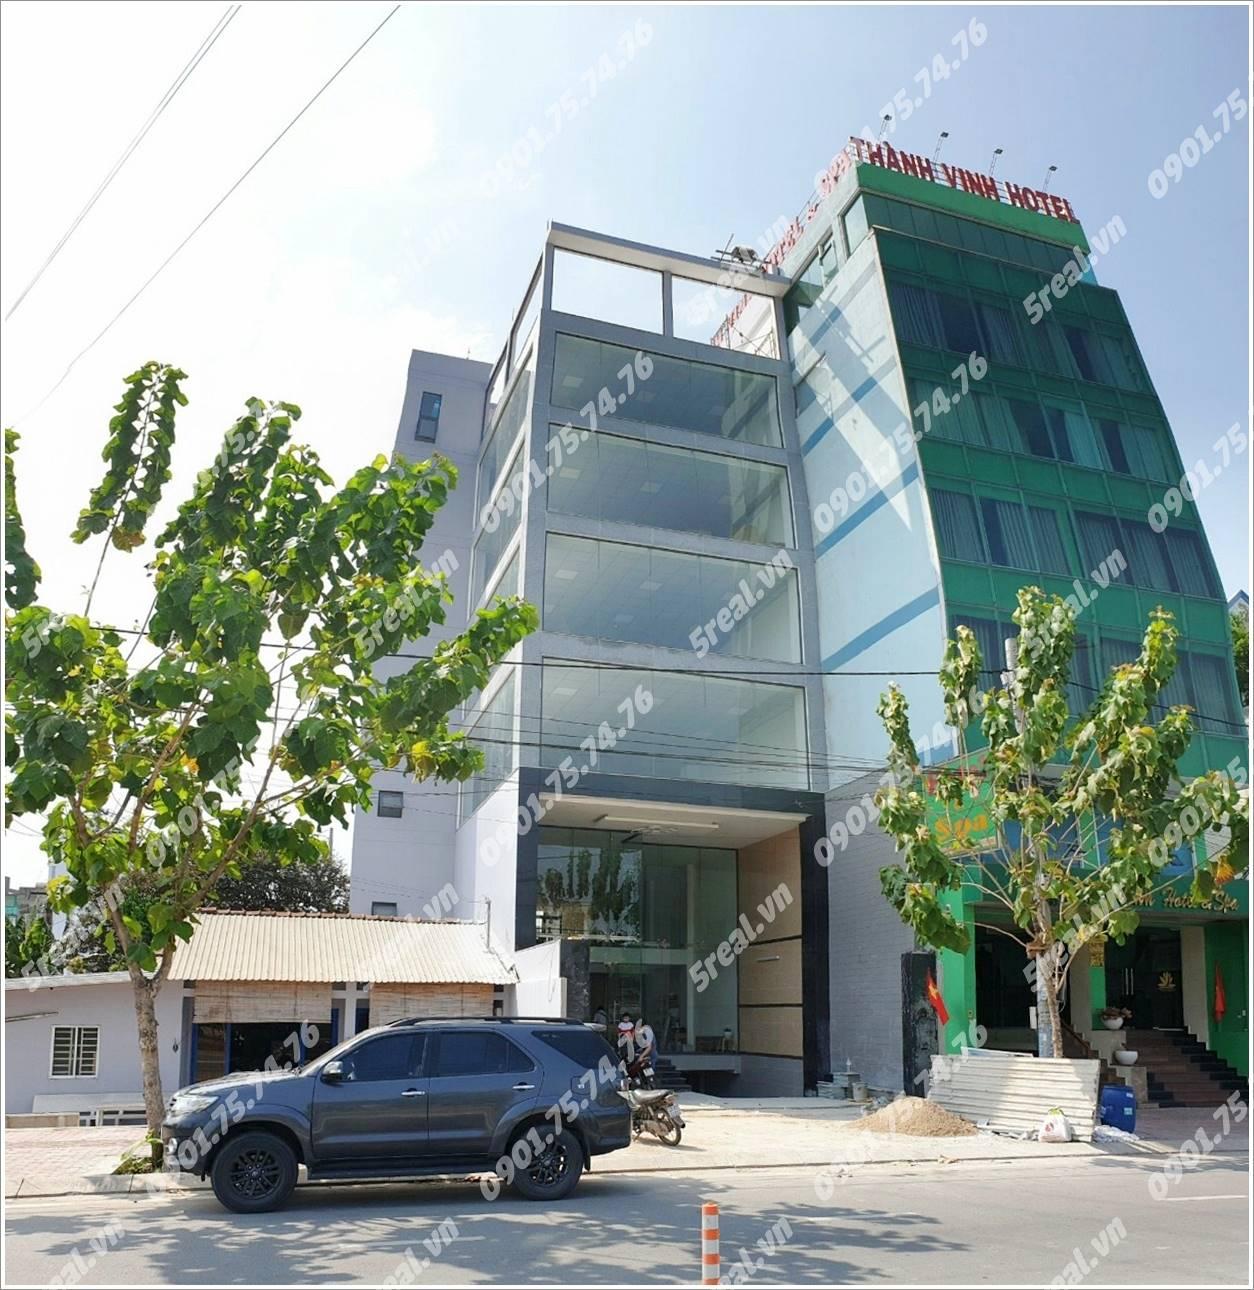 phuoc-long-a-building-xa-lo-ha-noi-quan-9-van-phong-cho-thue-5real.vn-01